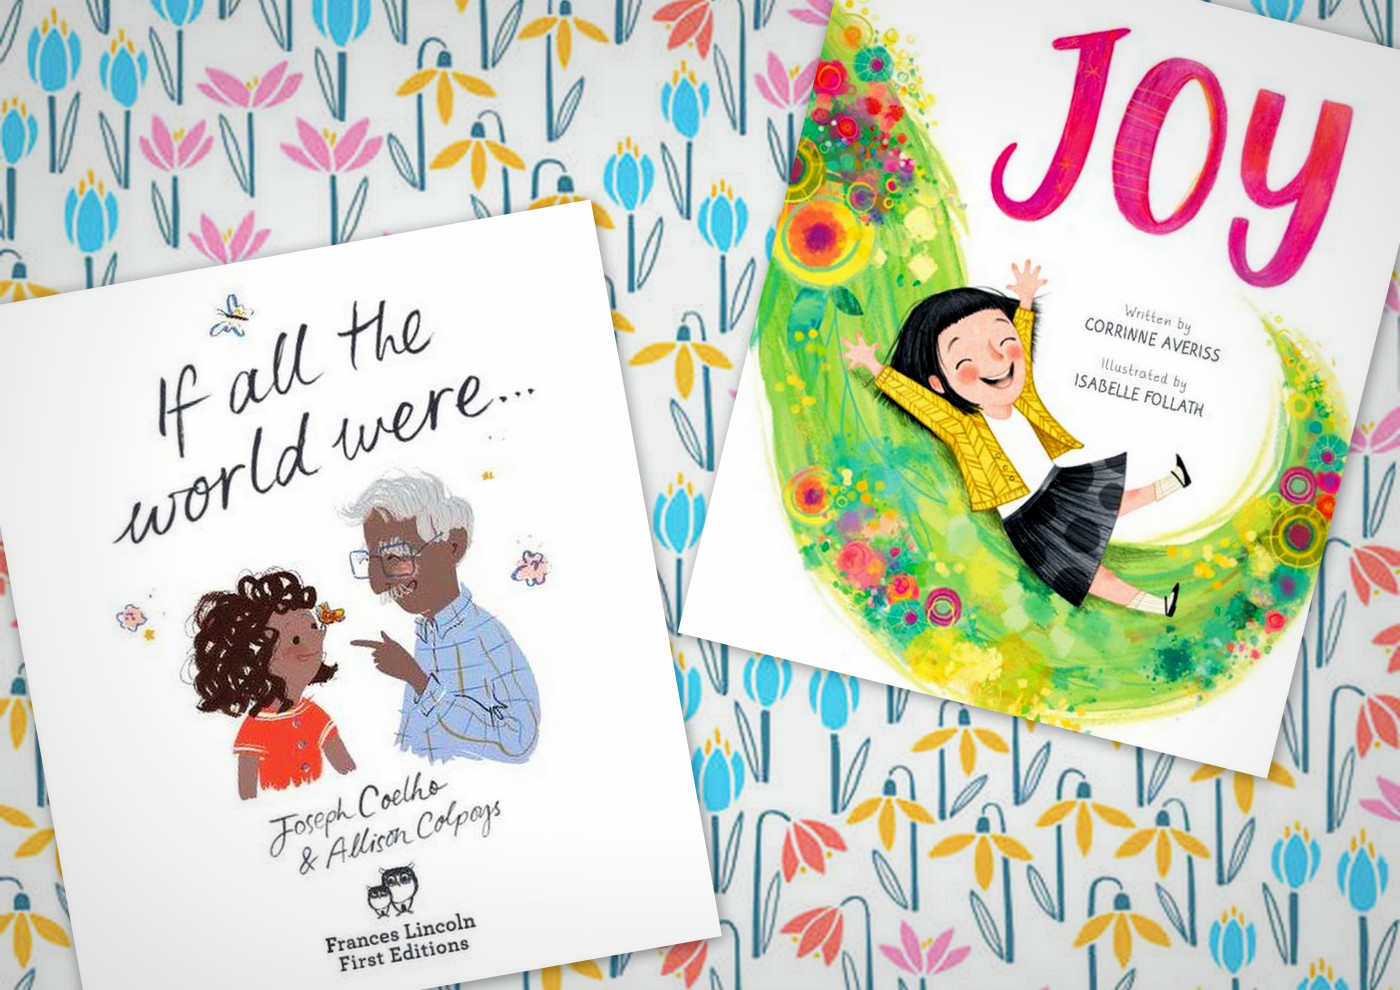 Joy by Corrine Averiss & If All the World by Joseph Coelho – Tale of a Bookworm